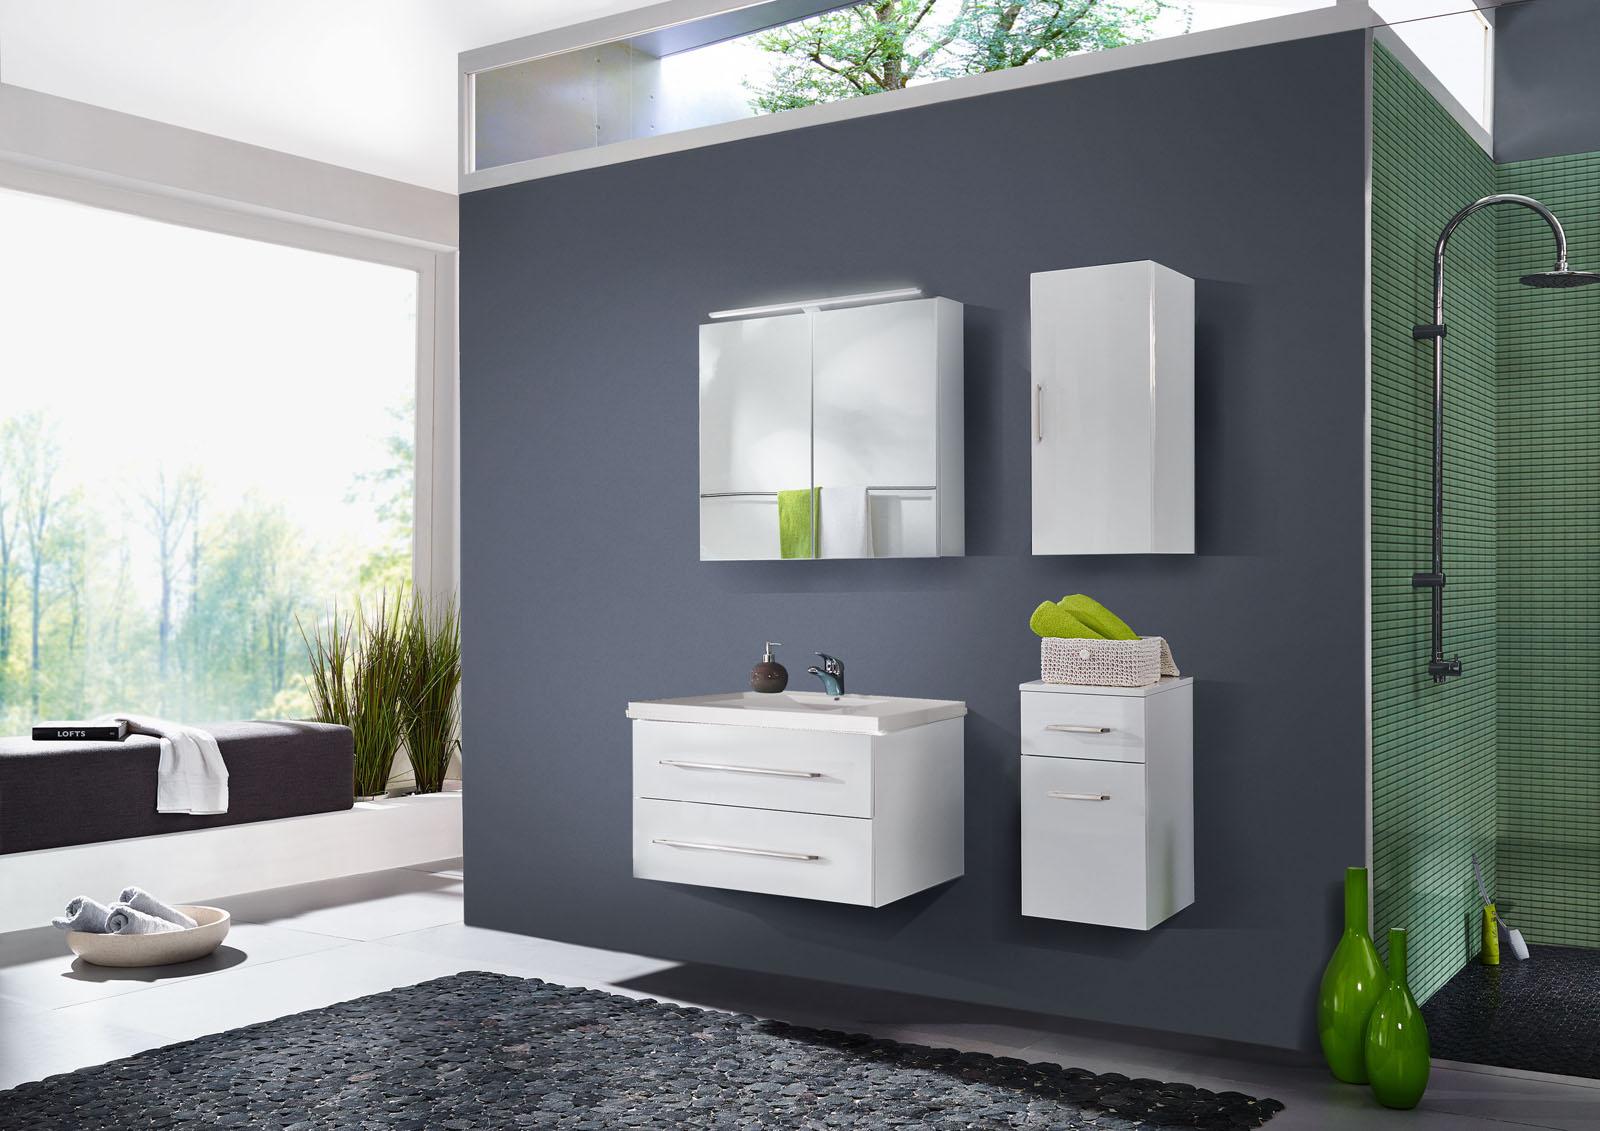 sale badezimmer set 4tlg hochglanz wei 90 cm dublin. Black Bedroom Furniture Sets. Home Design Ideas